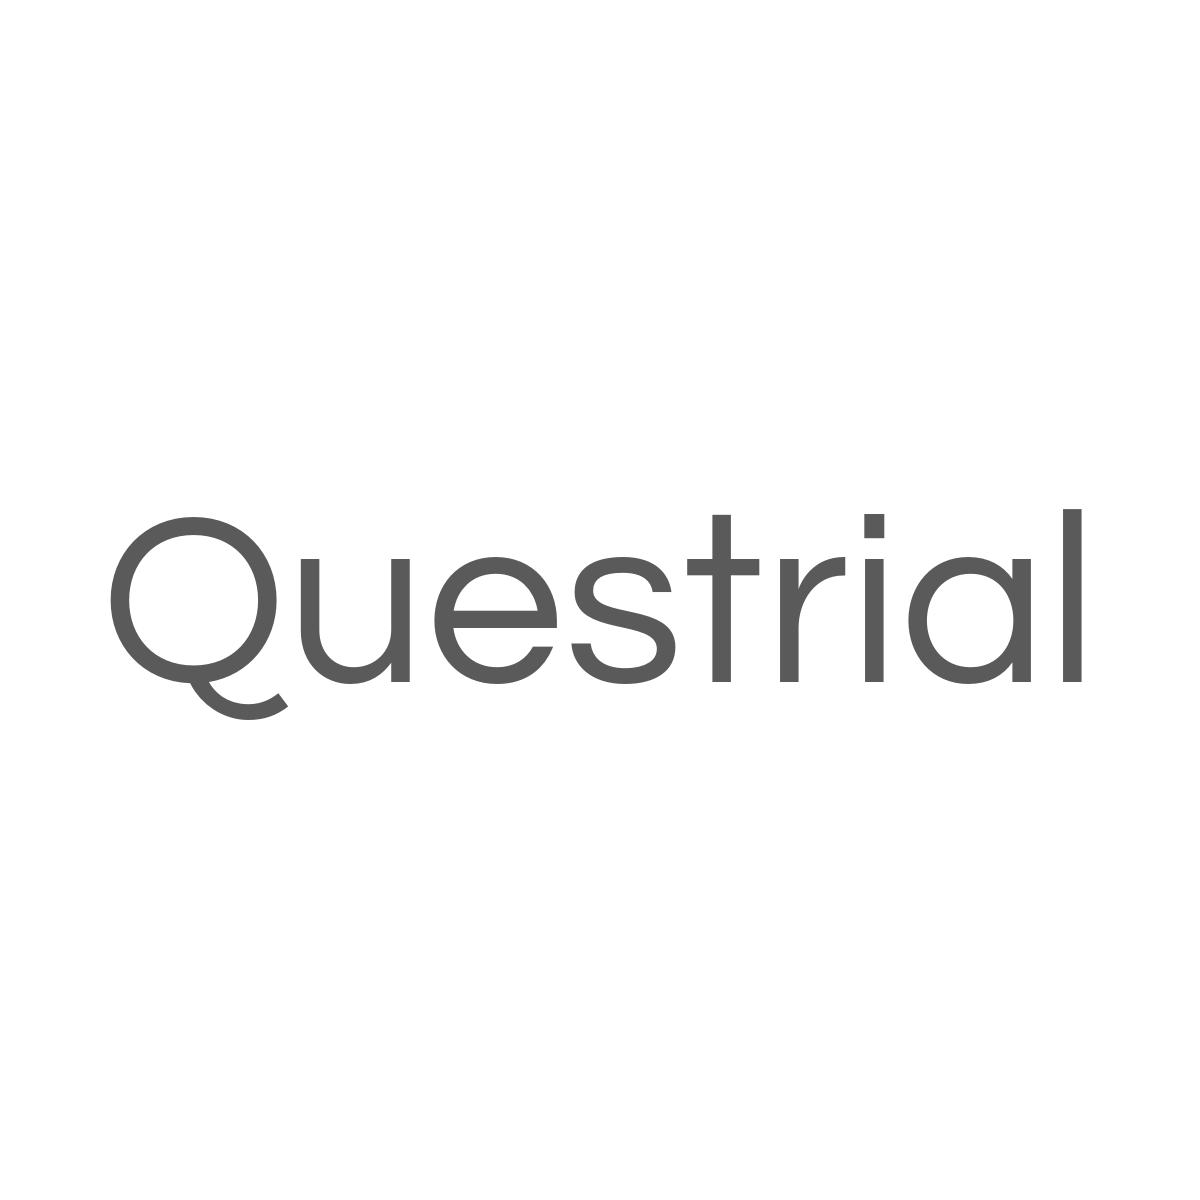 Questrial